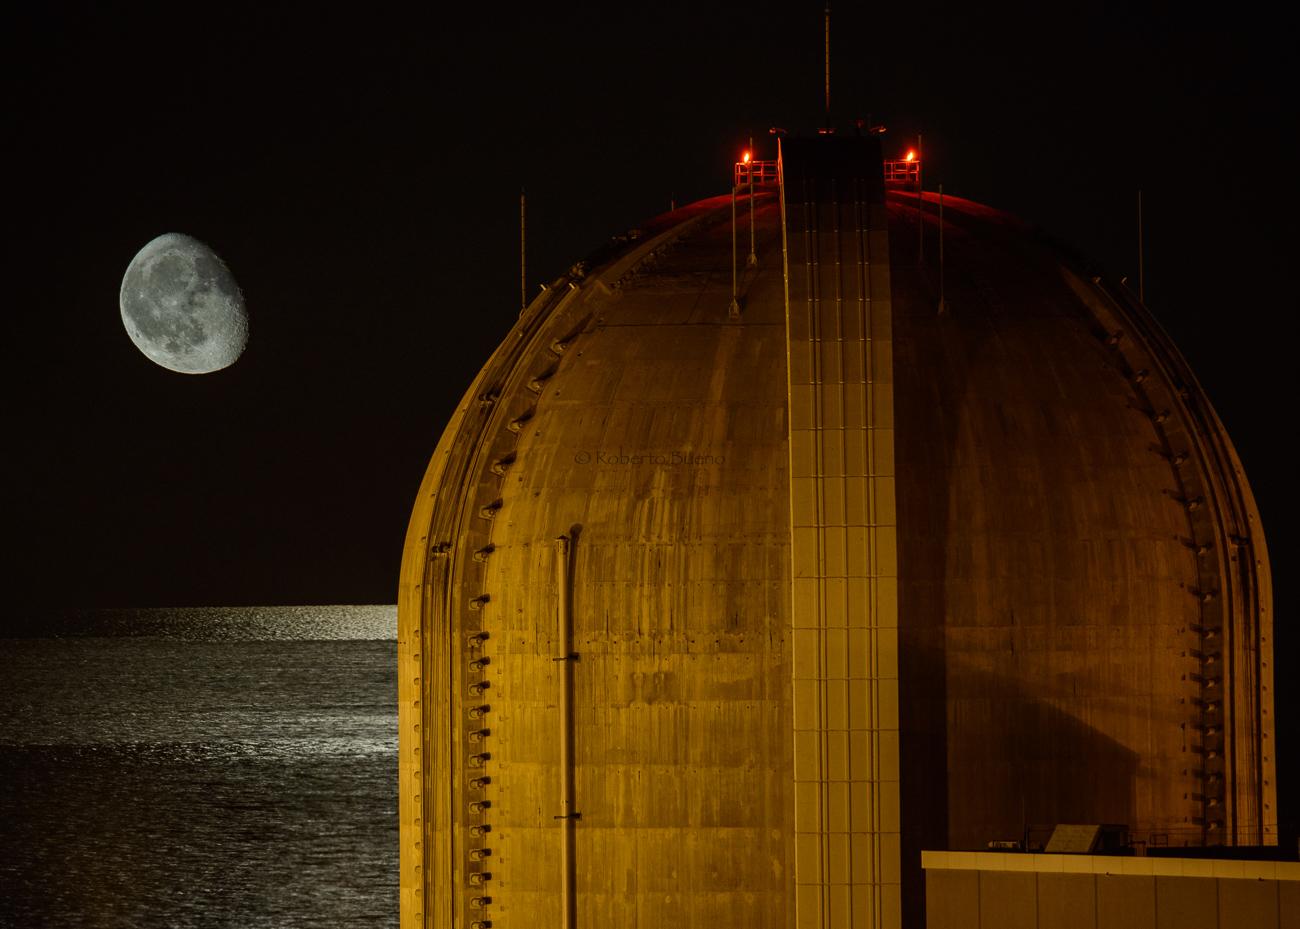 Luna y mar. Central Nuclear Vandellòs II - Energía Nuclear - Roberto Bueno. Energía Nuclear y Centrales Nucleares